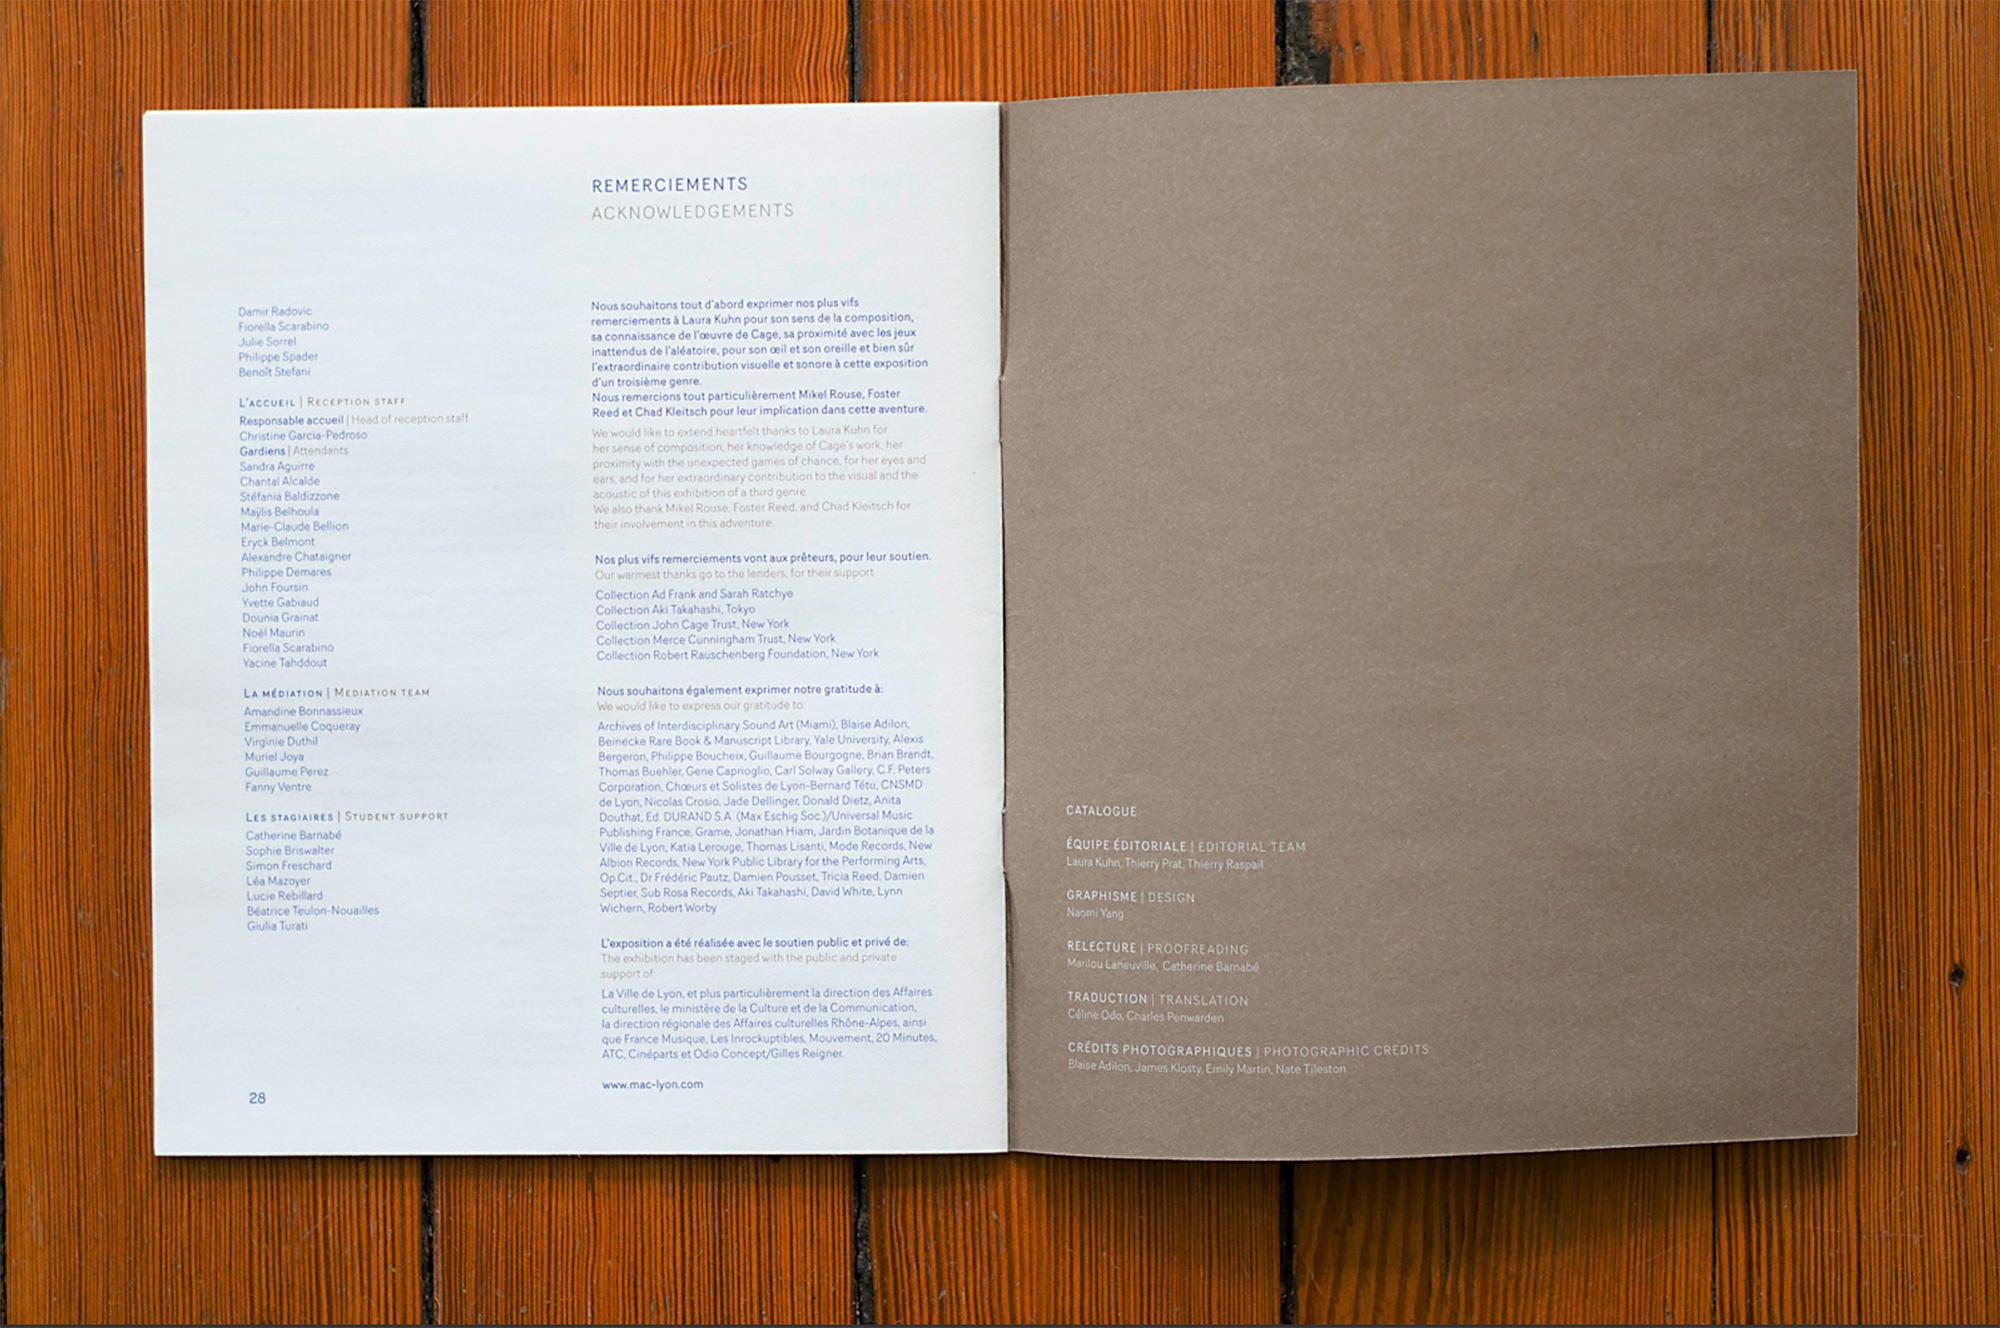 Cage's Satie Composition for Museum Catalogue